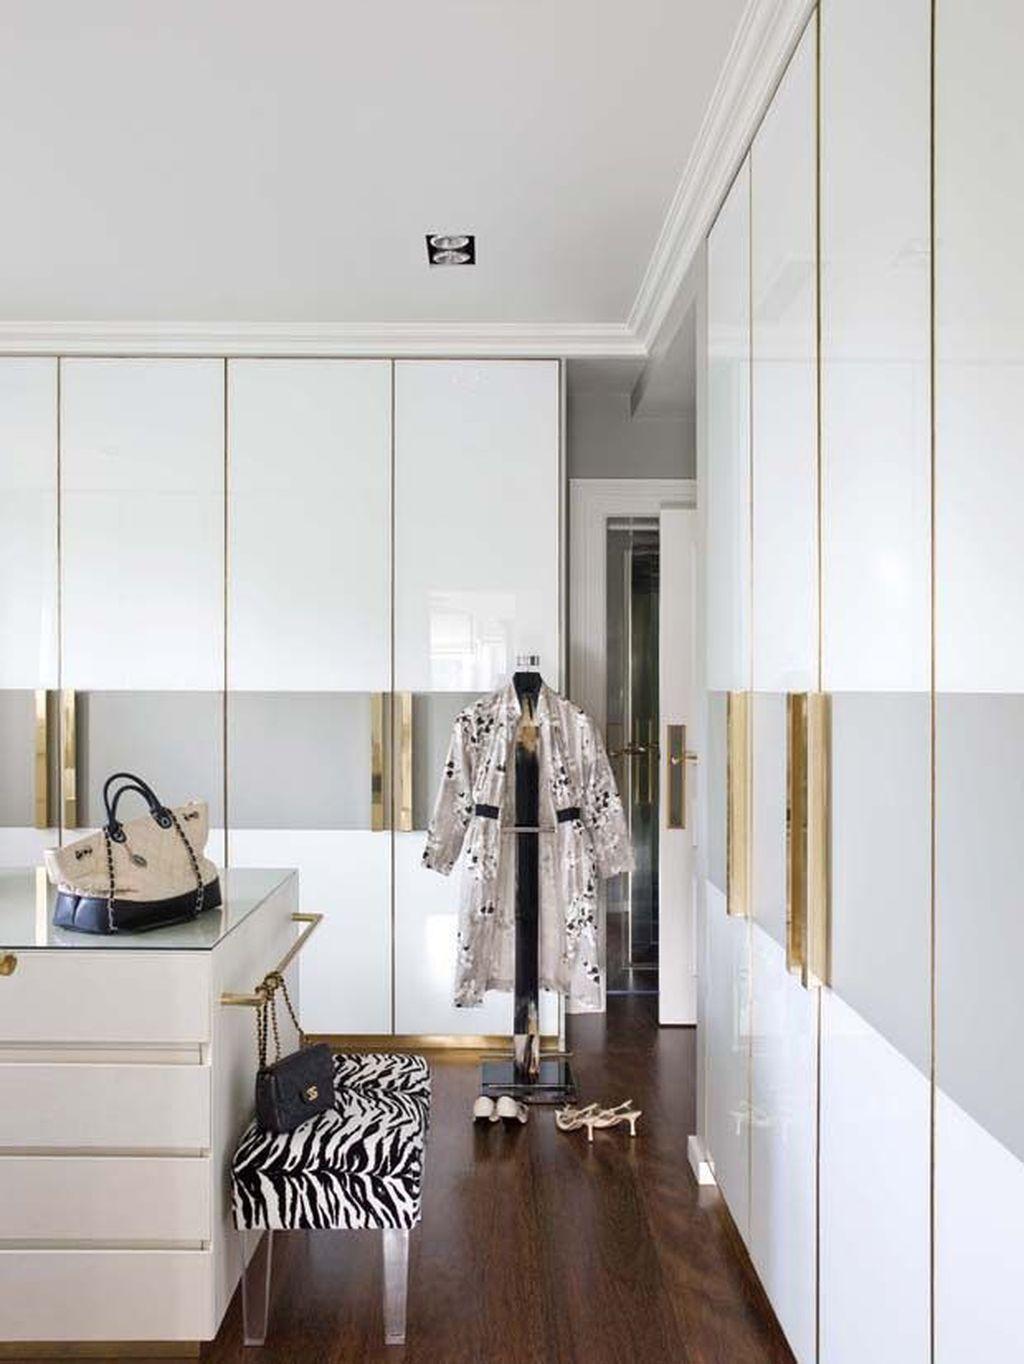 Rustic Wardrobe Design Ideas That Is In Trend 21